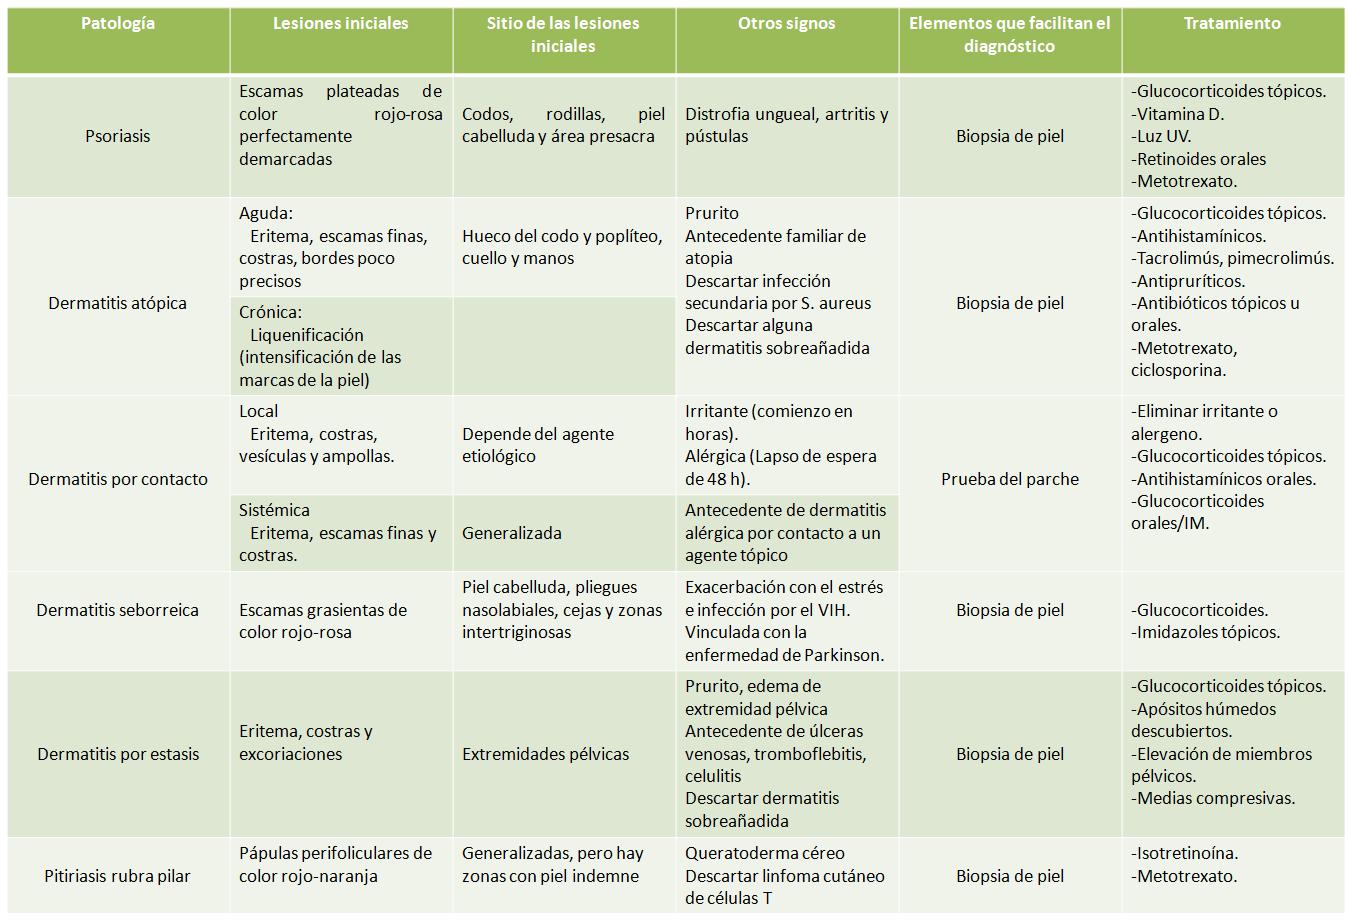 Diagnóstico diferencial de eritrodermia